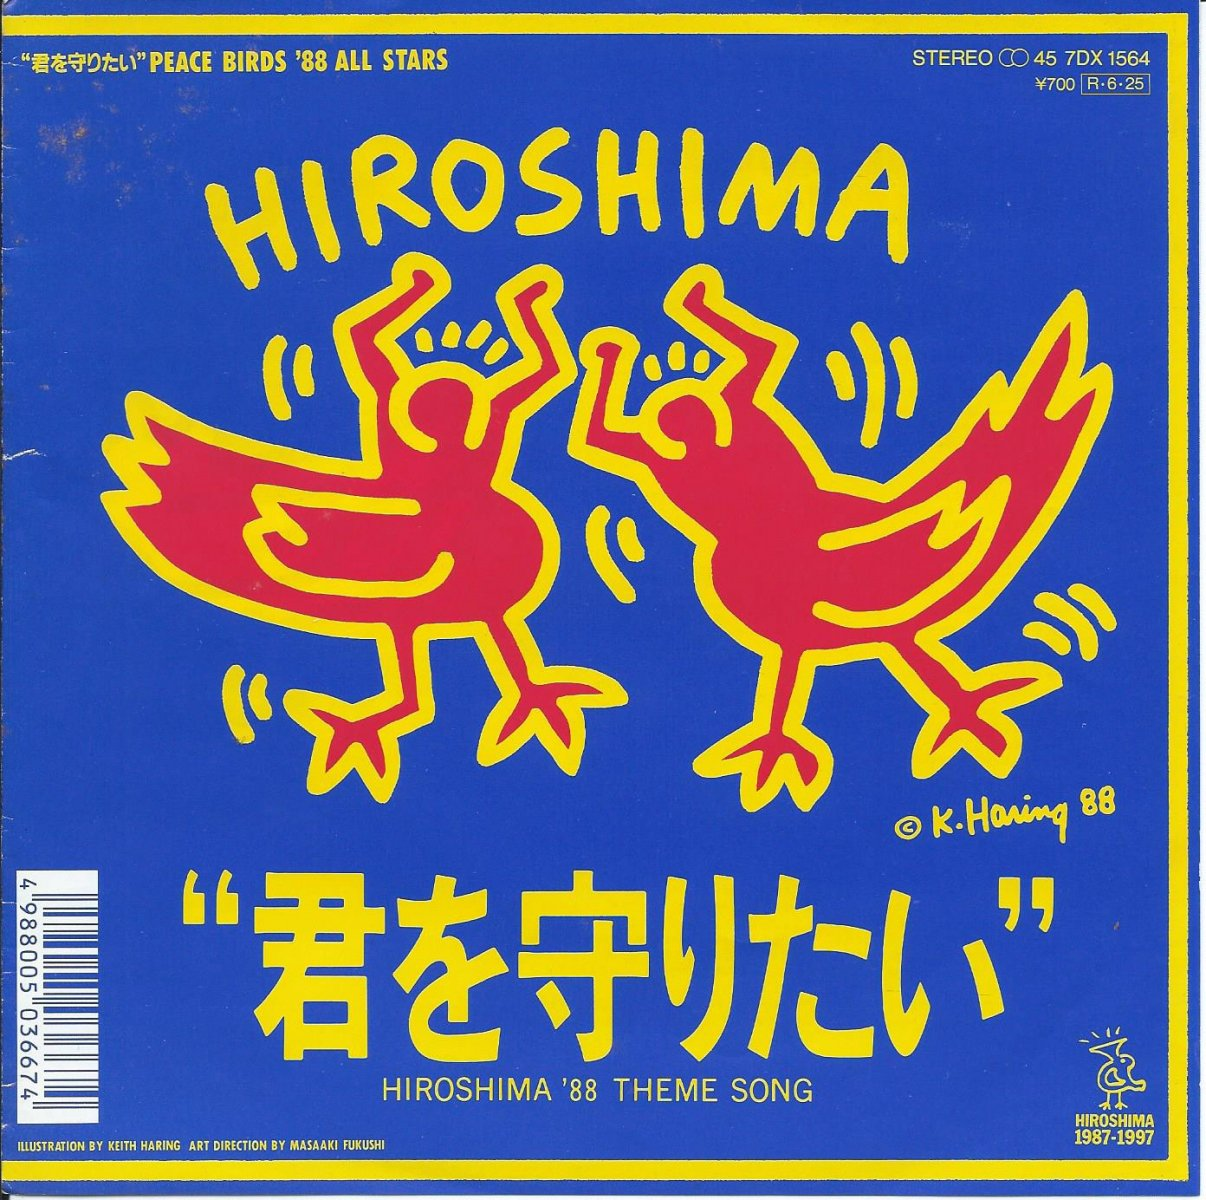 PEACE BIRDS '88 ALL STARS / 君を守りたい / WOW WOW WOW (HIROSHIMA '88) (7